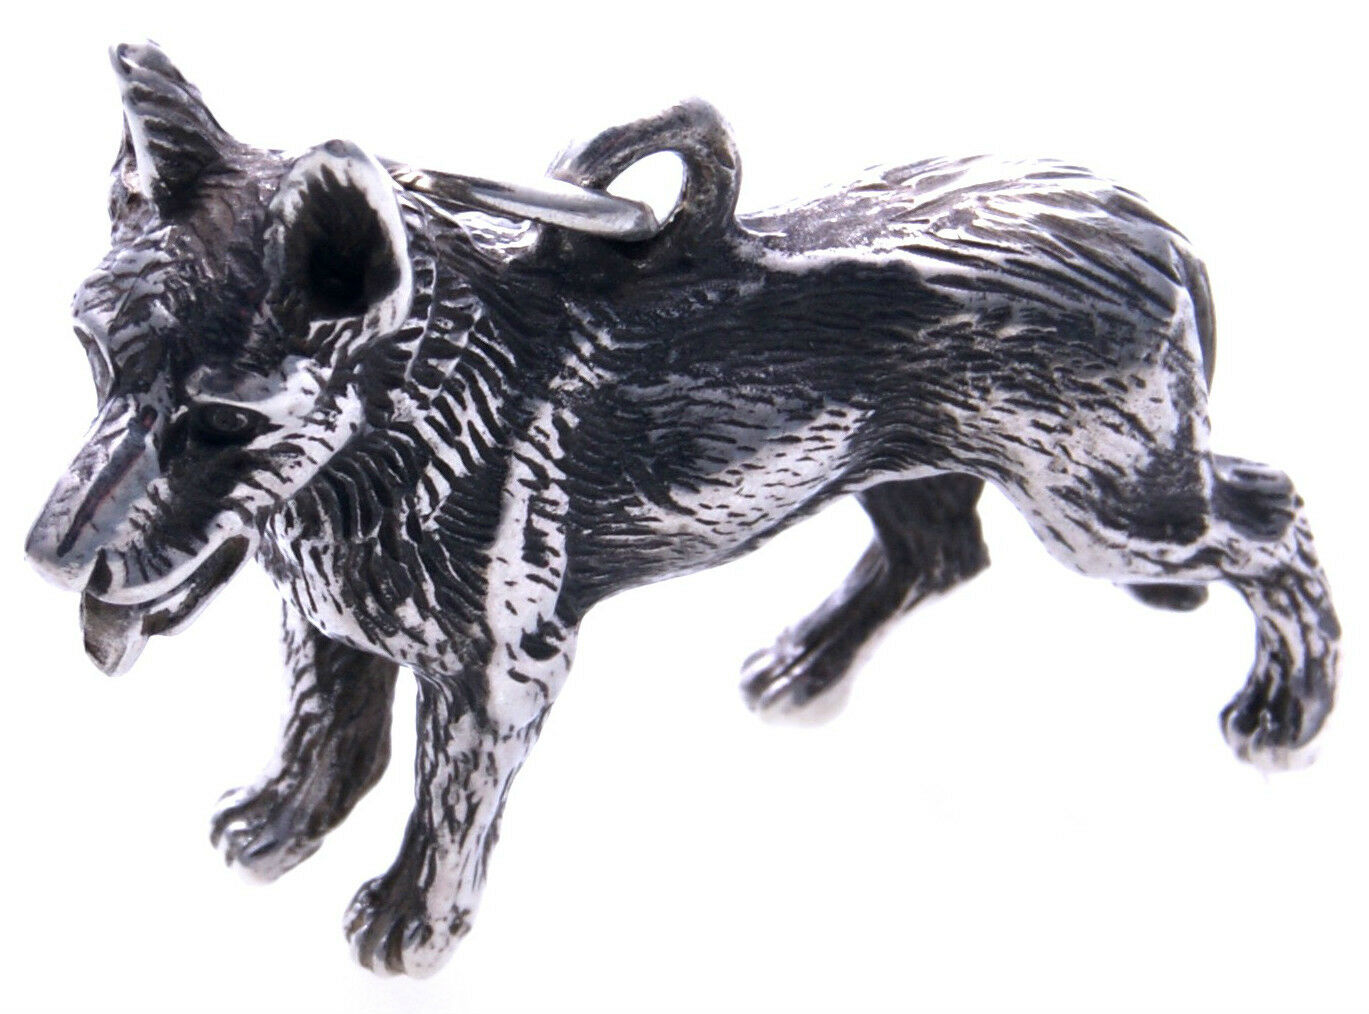 XL Anhänger Schäferhund groß silver 925 massiv Sterlingsilver Hund Unisex